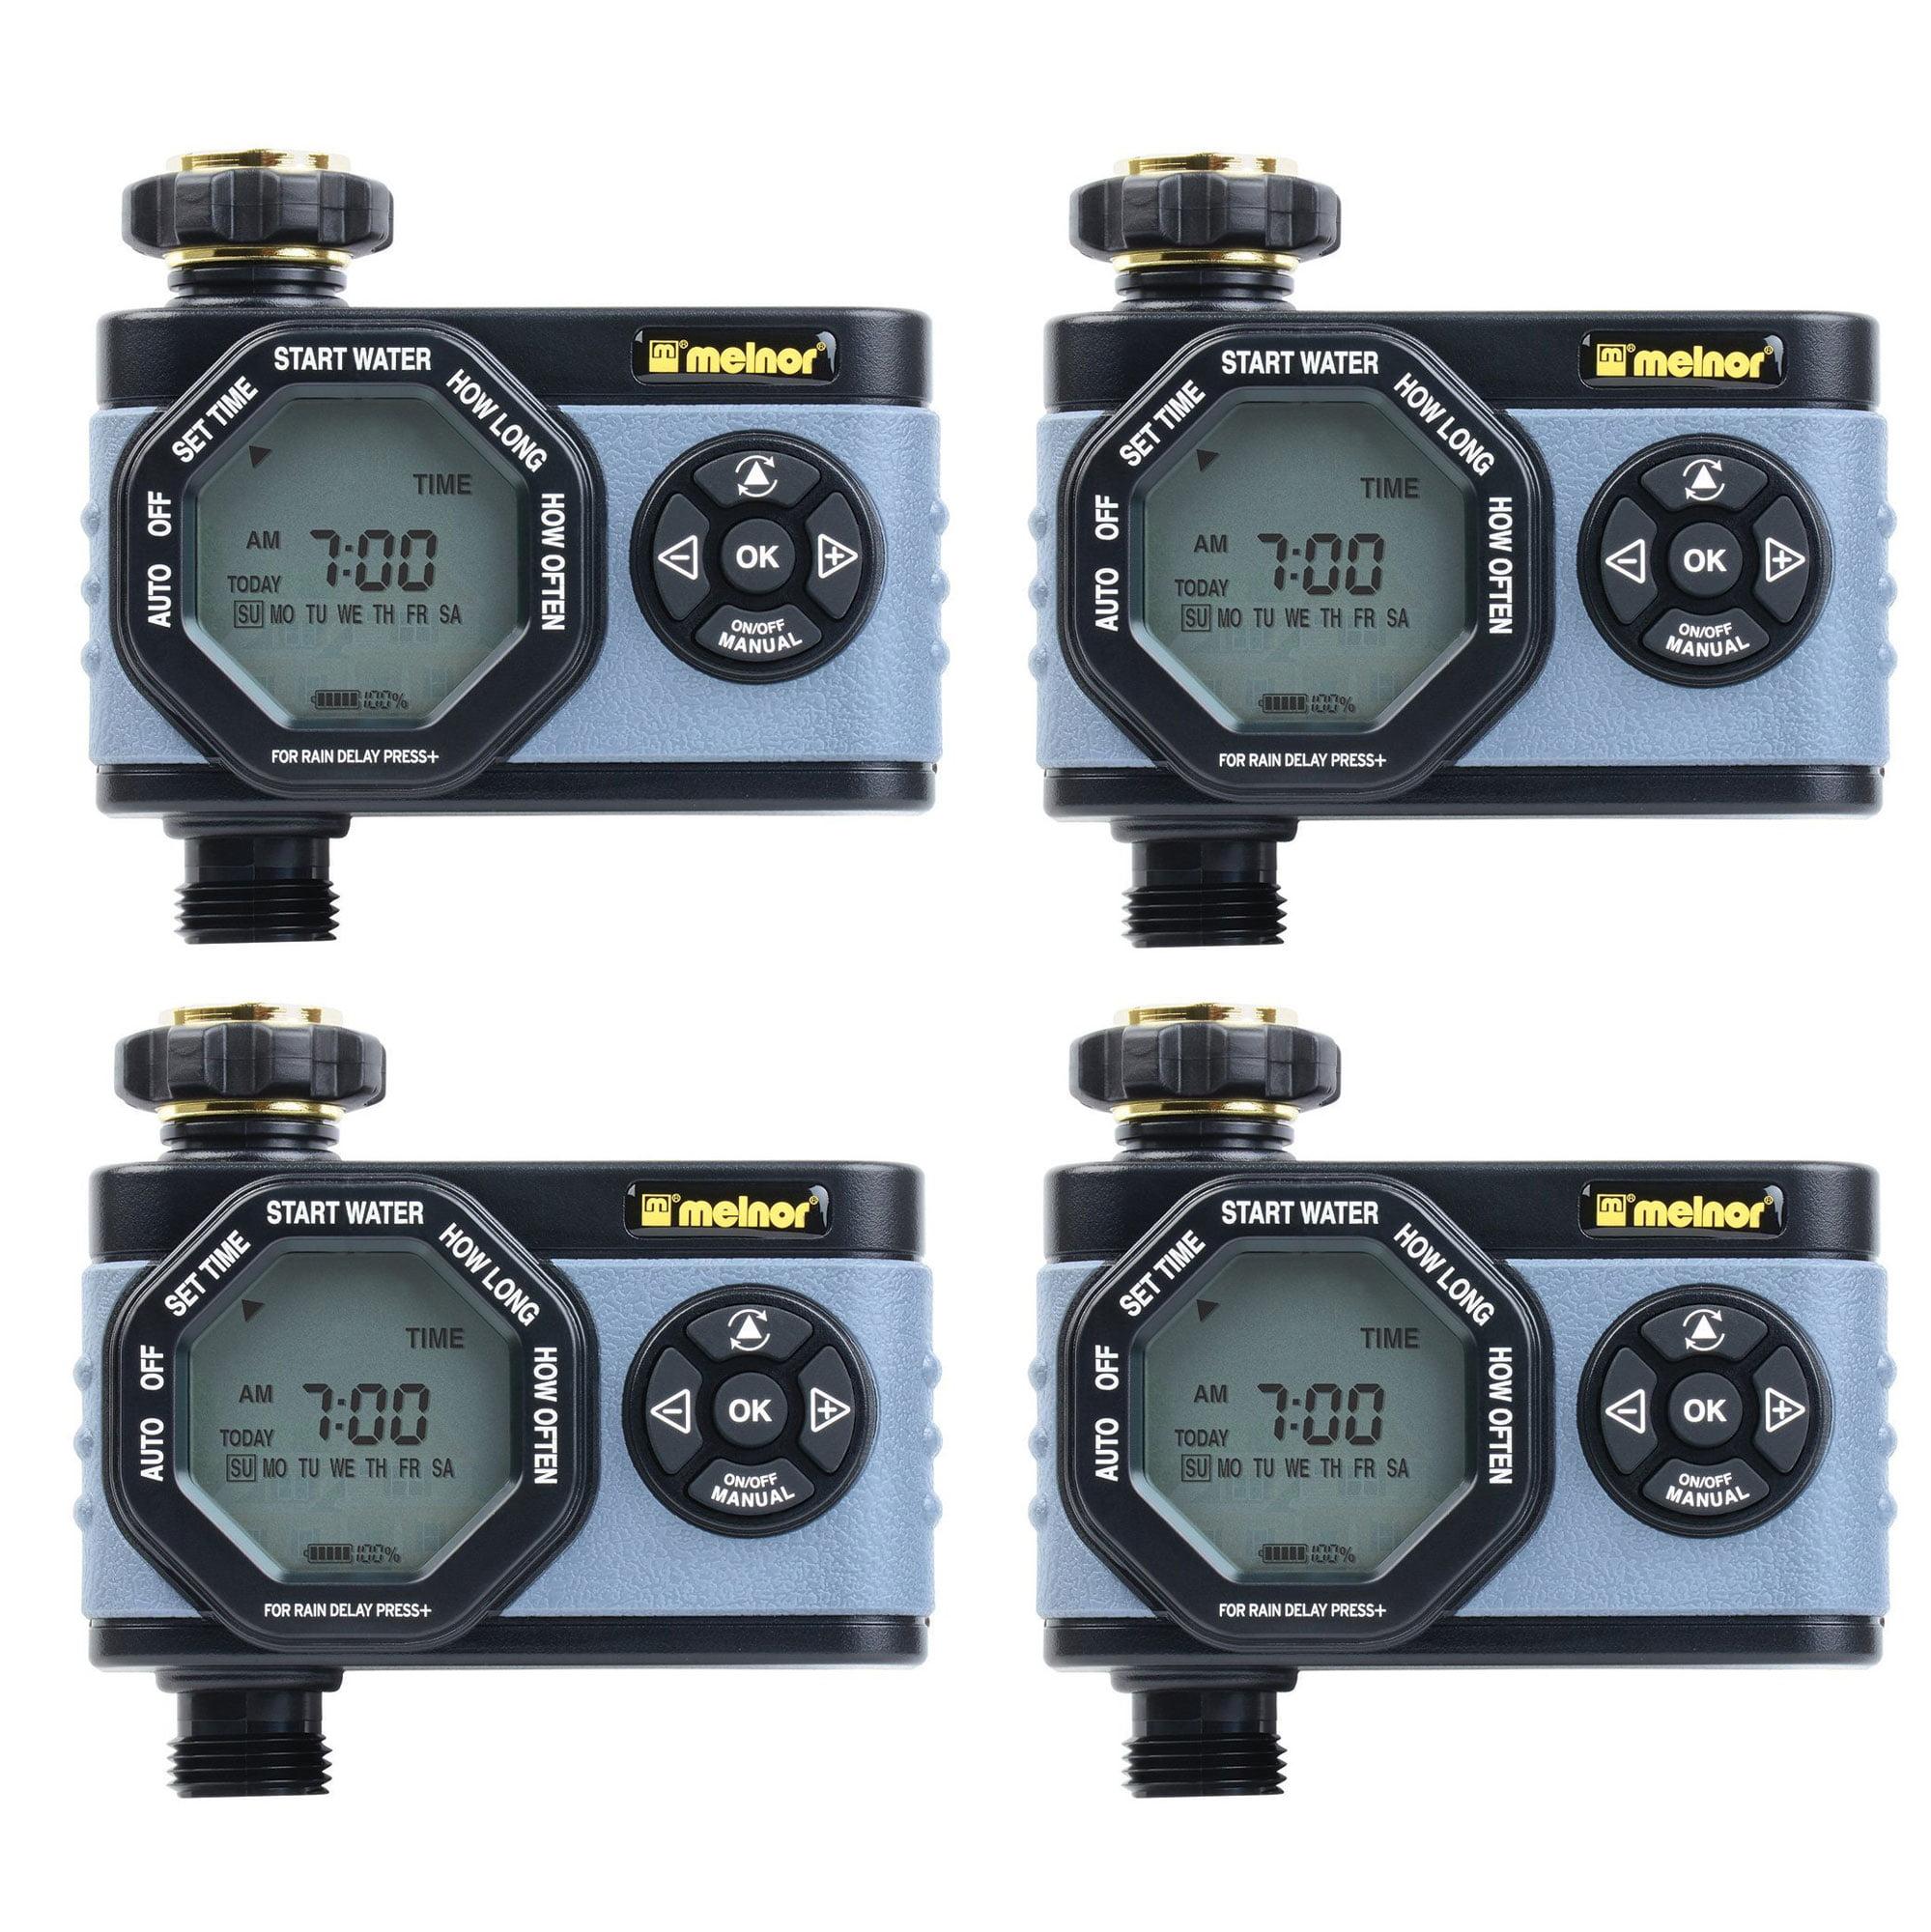 Melnor HydroLogic Digital Programmable Garden Water Timer & Controller (4 Pack) by Melnor